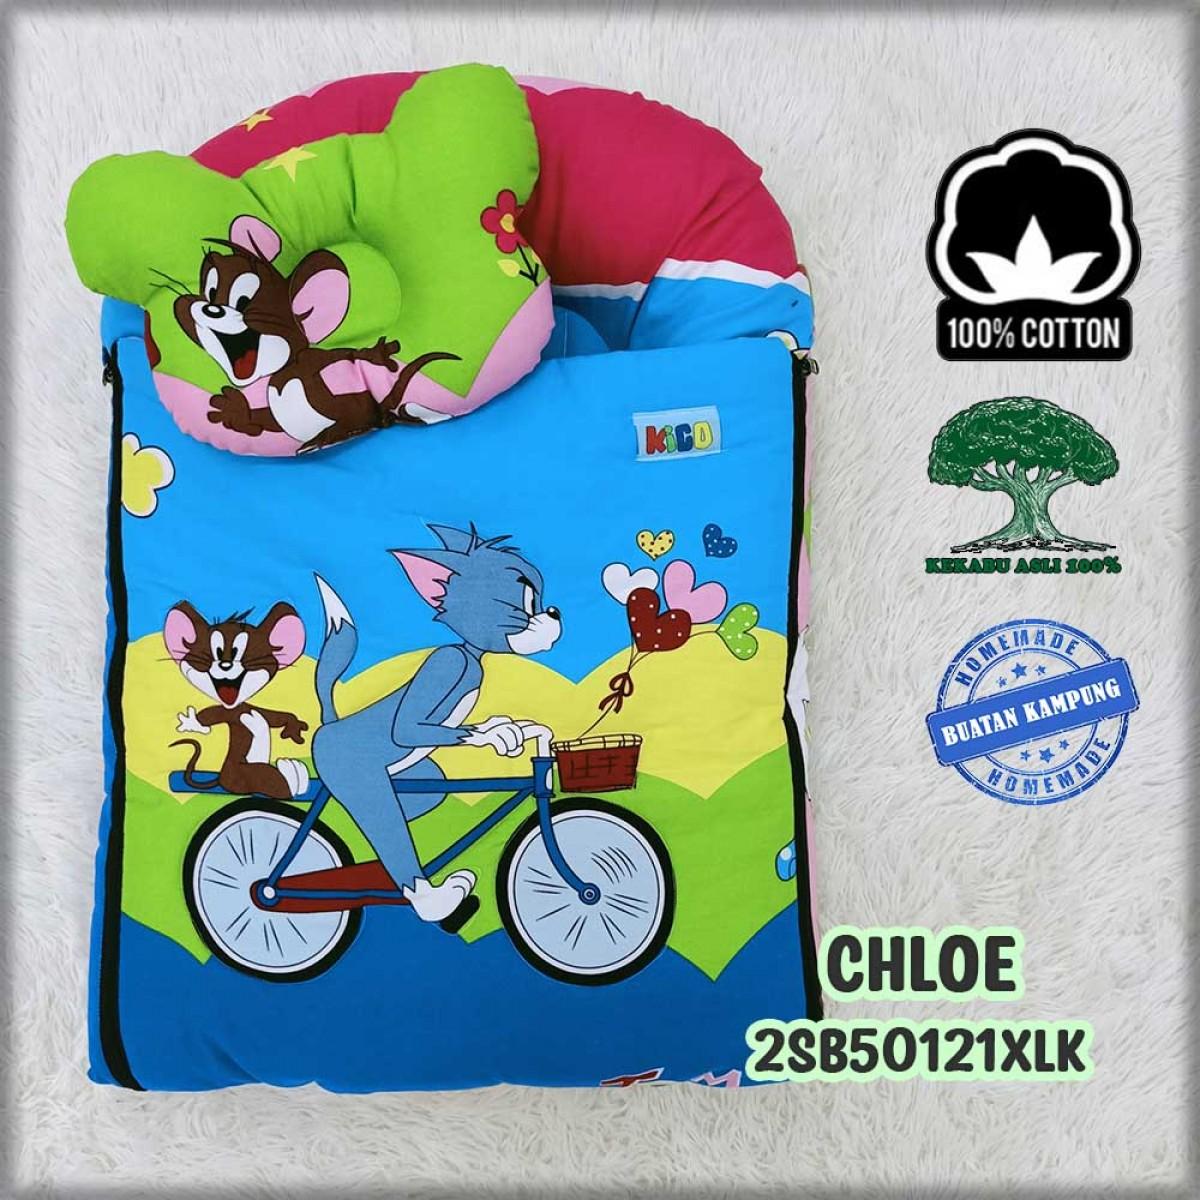 Chloe - Kico Baby Center